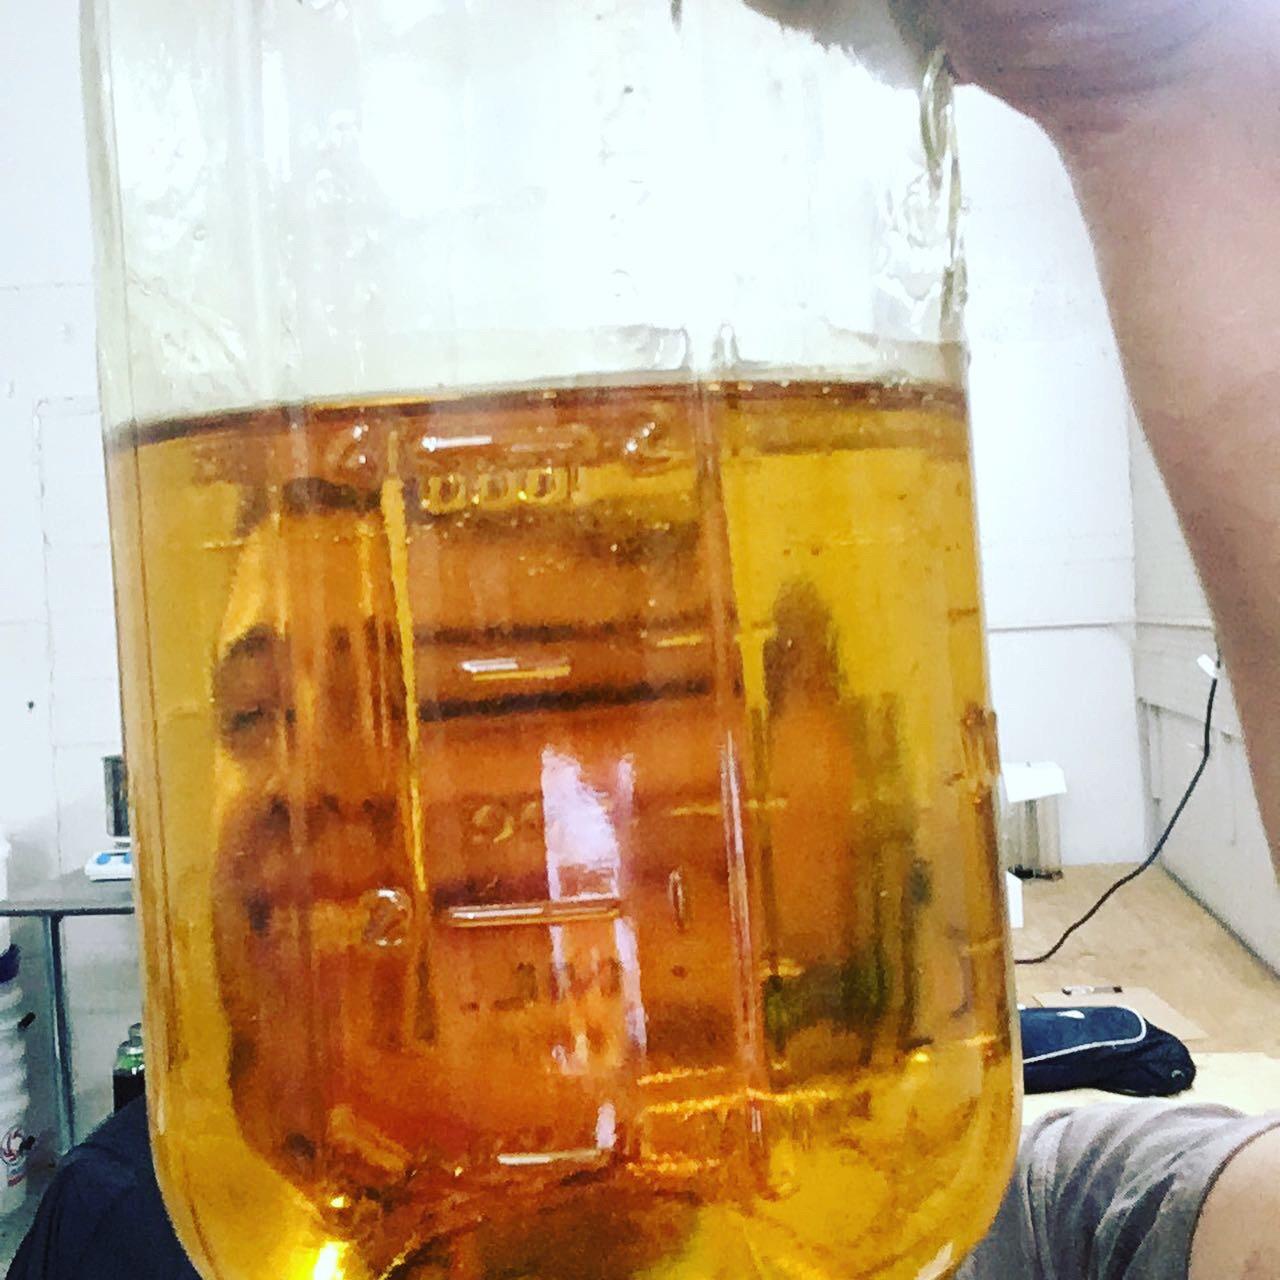 Broad Spectrum CBD Distillate (90%+ Cannabs) - CannaBusiness